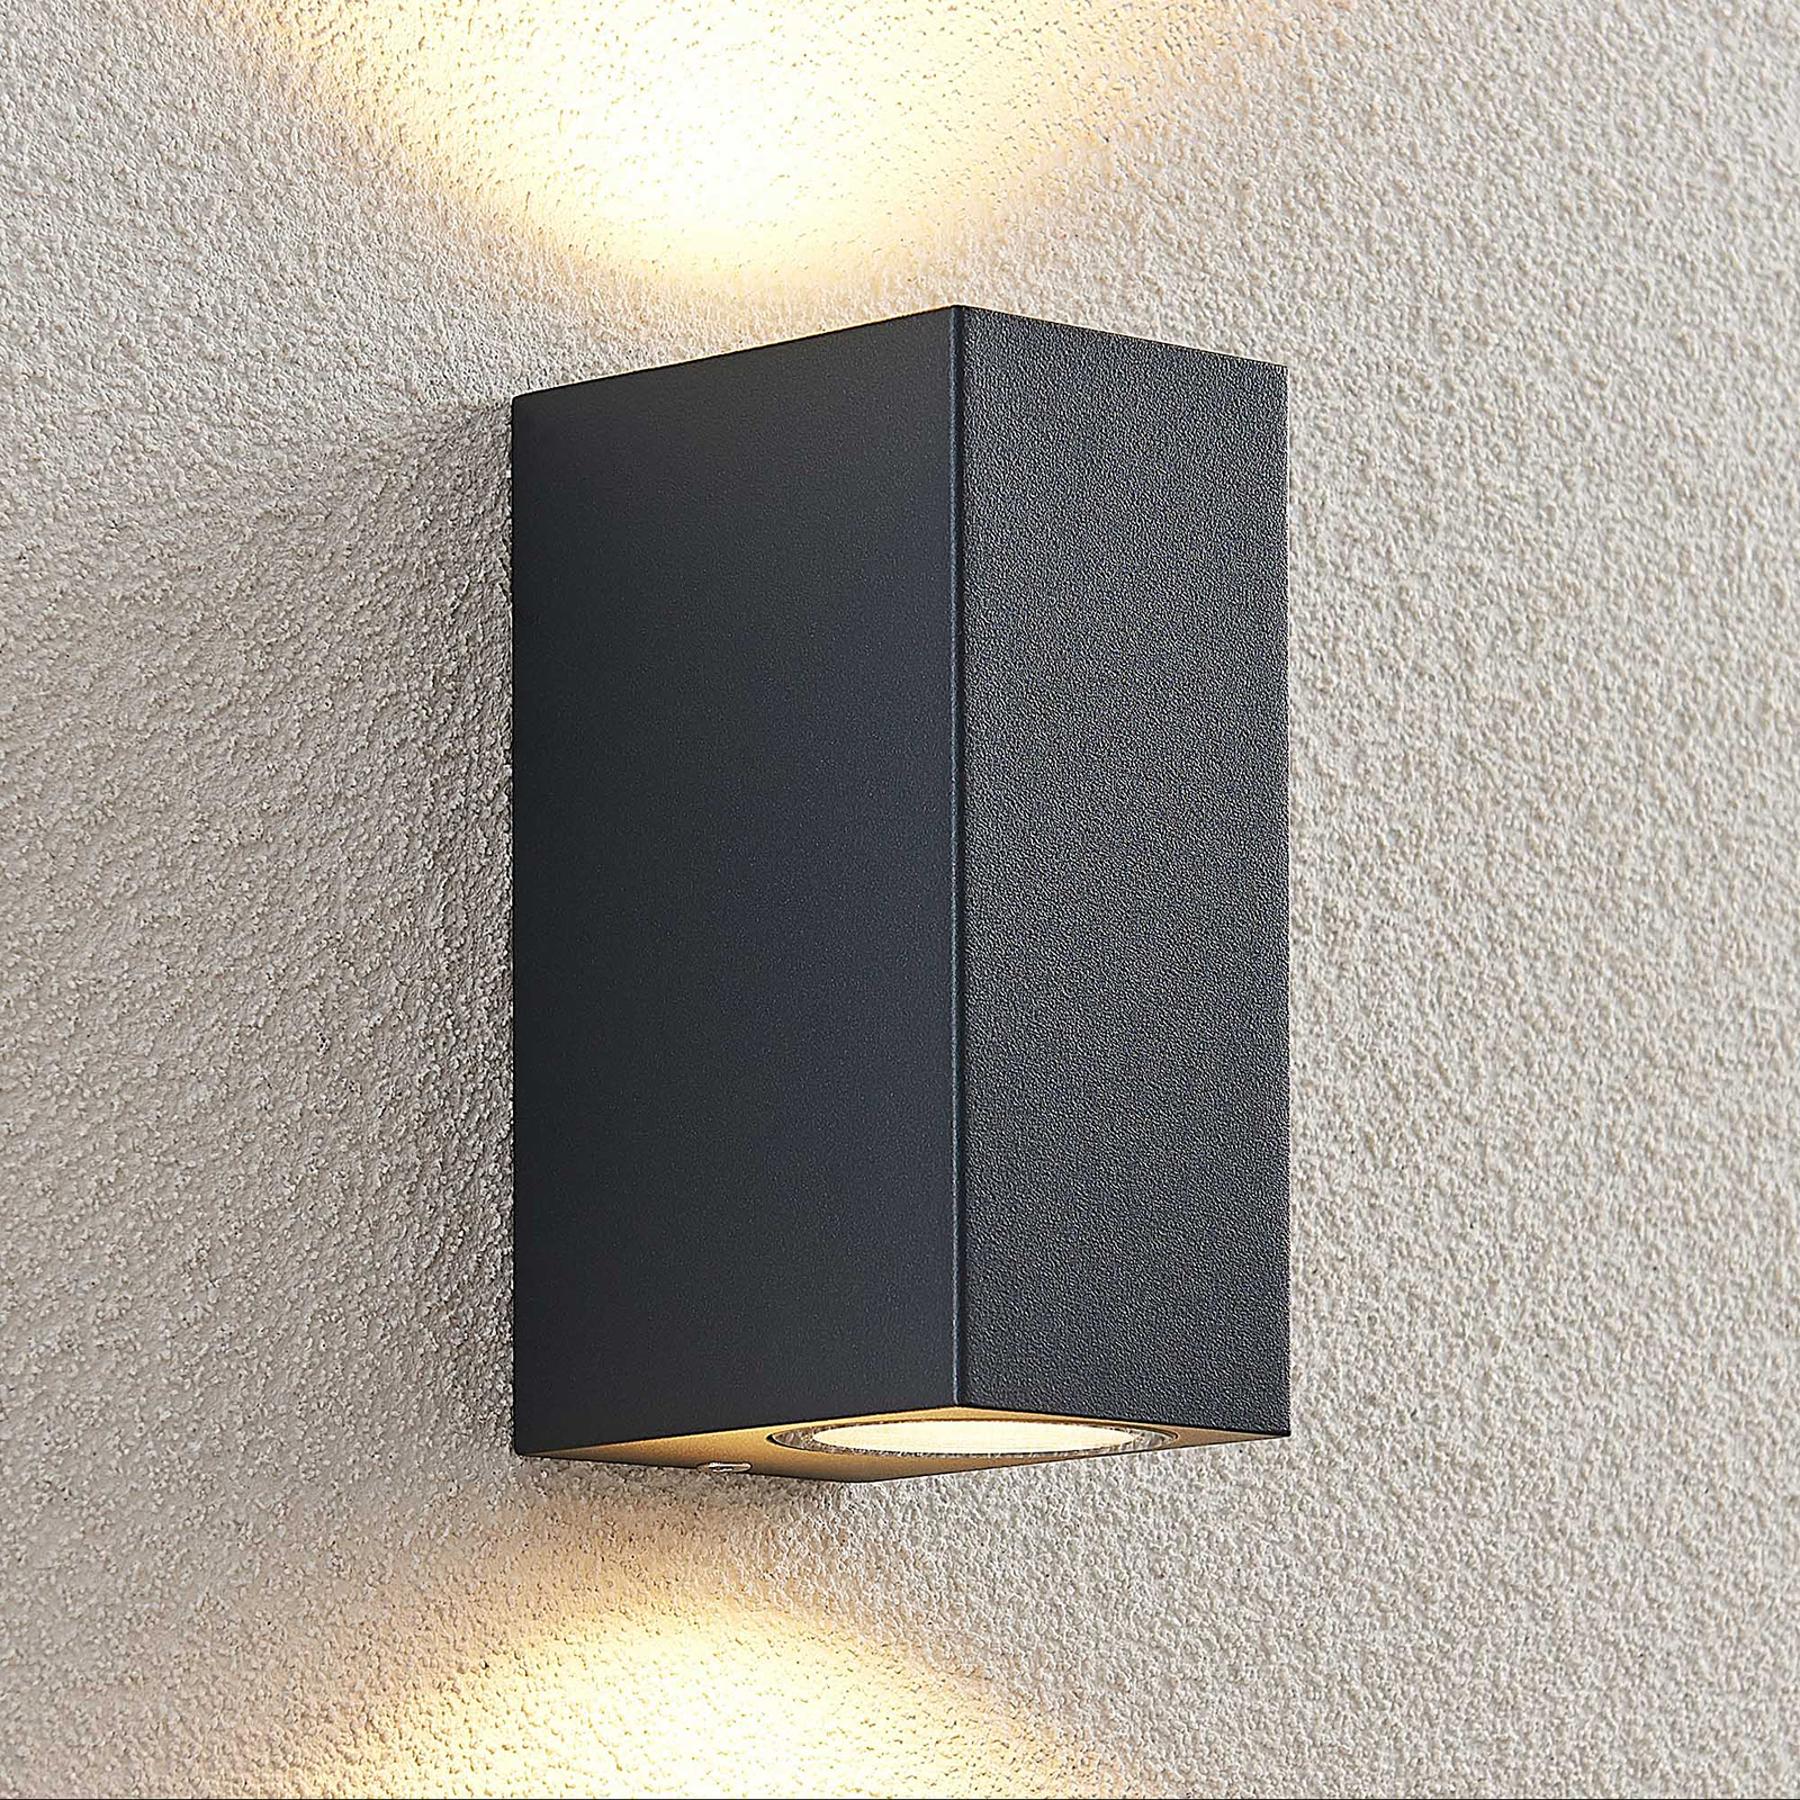 Eco Light utebelysning du kan köpa online | Lampkultur.se